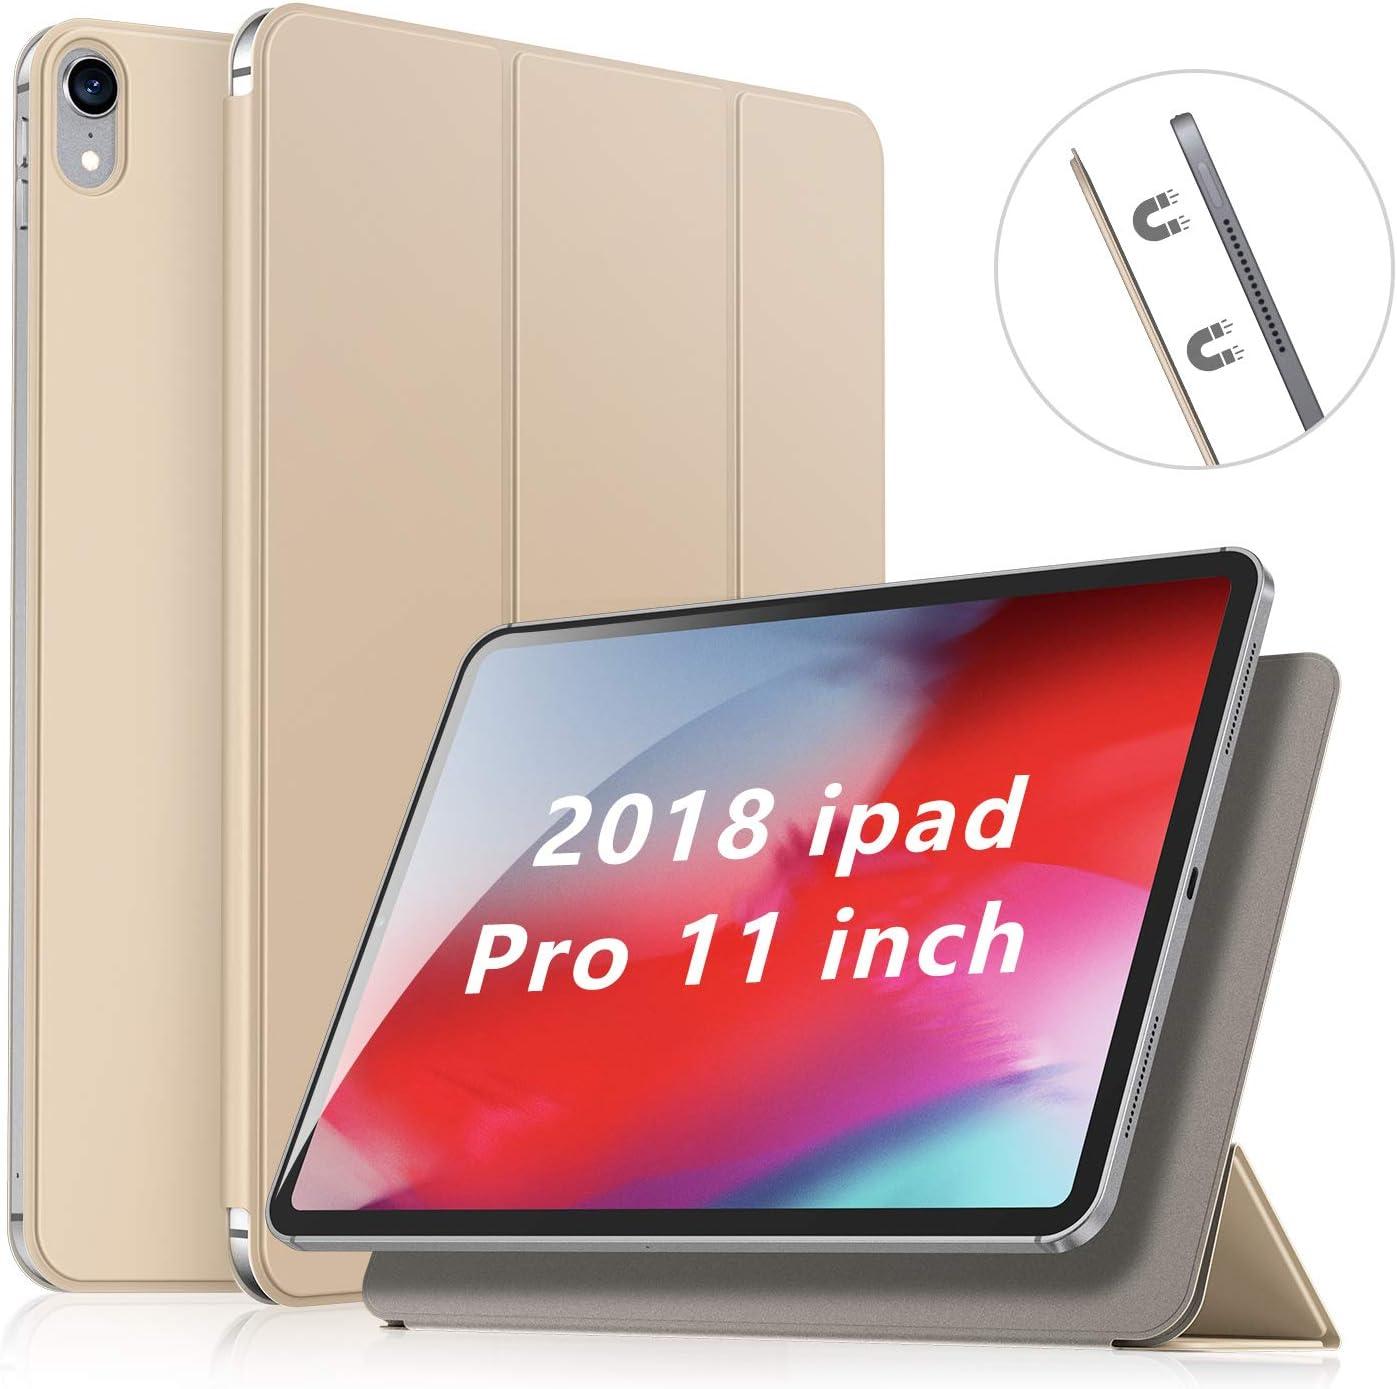 SmartDevil Funda Compatible iPad Pro 11 Pulgadas Modelo 2018, No para el Modelo 2020, Carcasa Folio Ligera con Tapa Inteligente/Reverso Translúcido, Oro Rosa